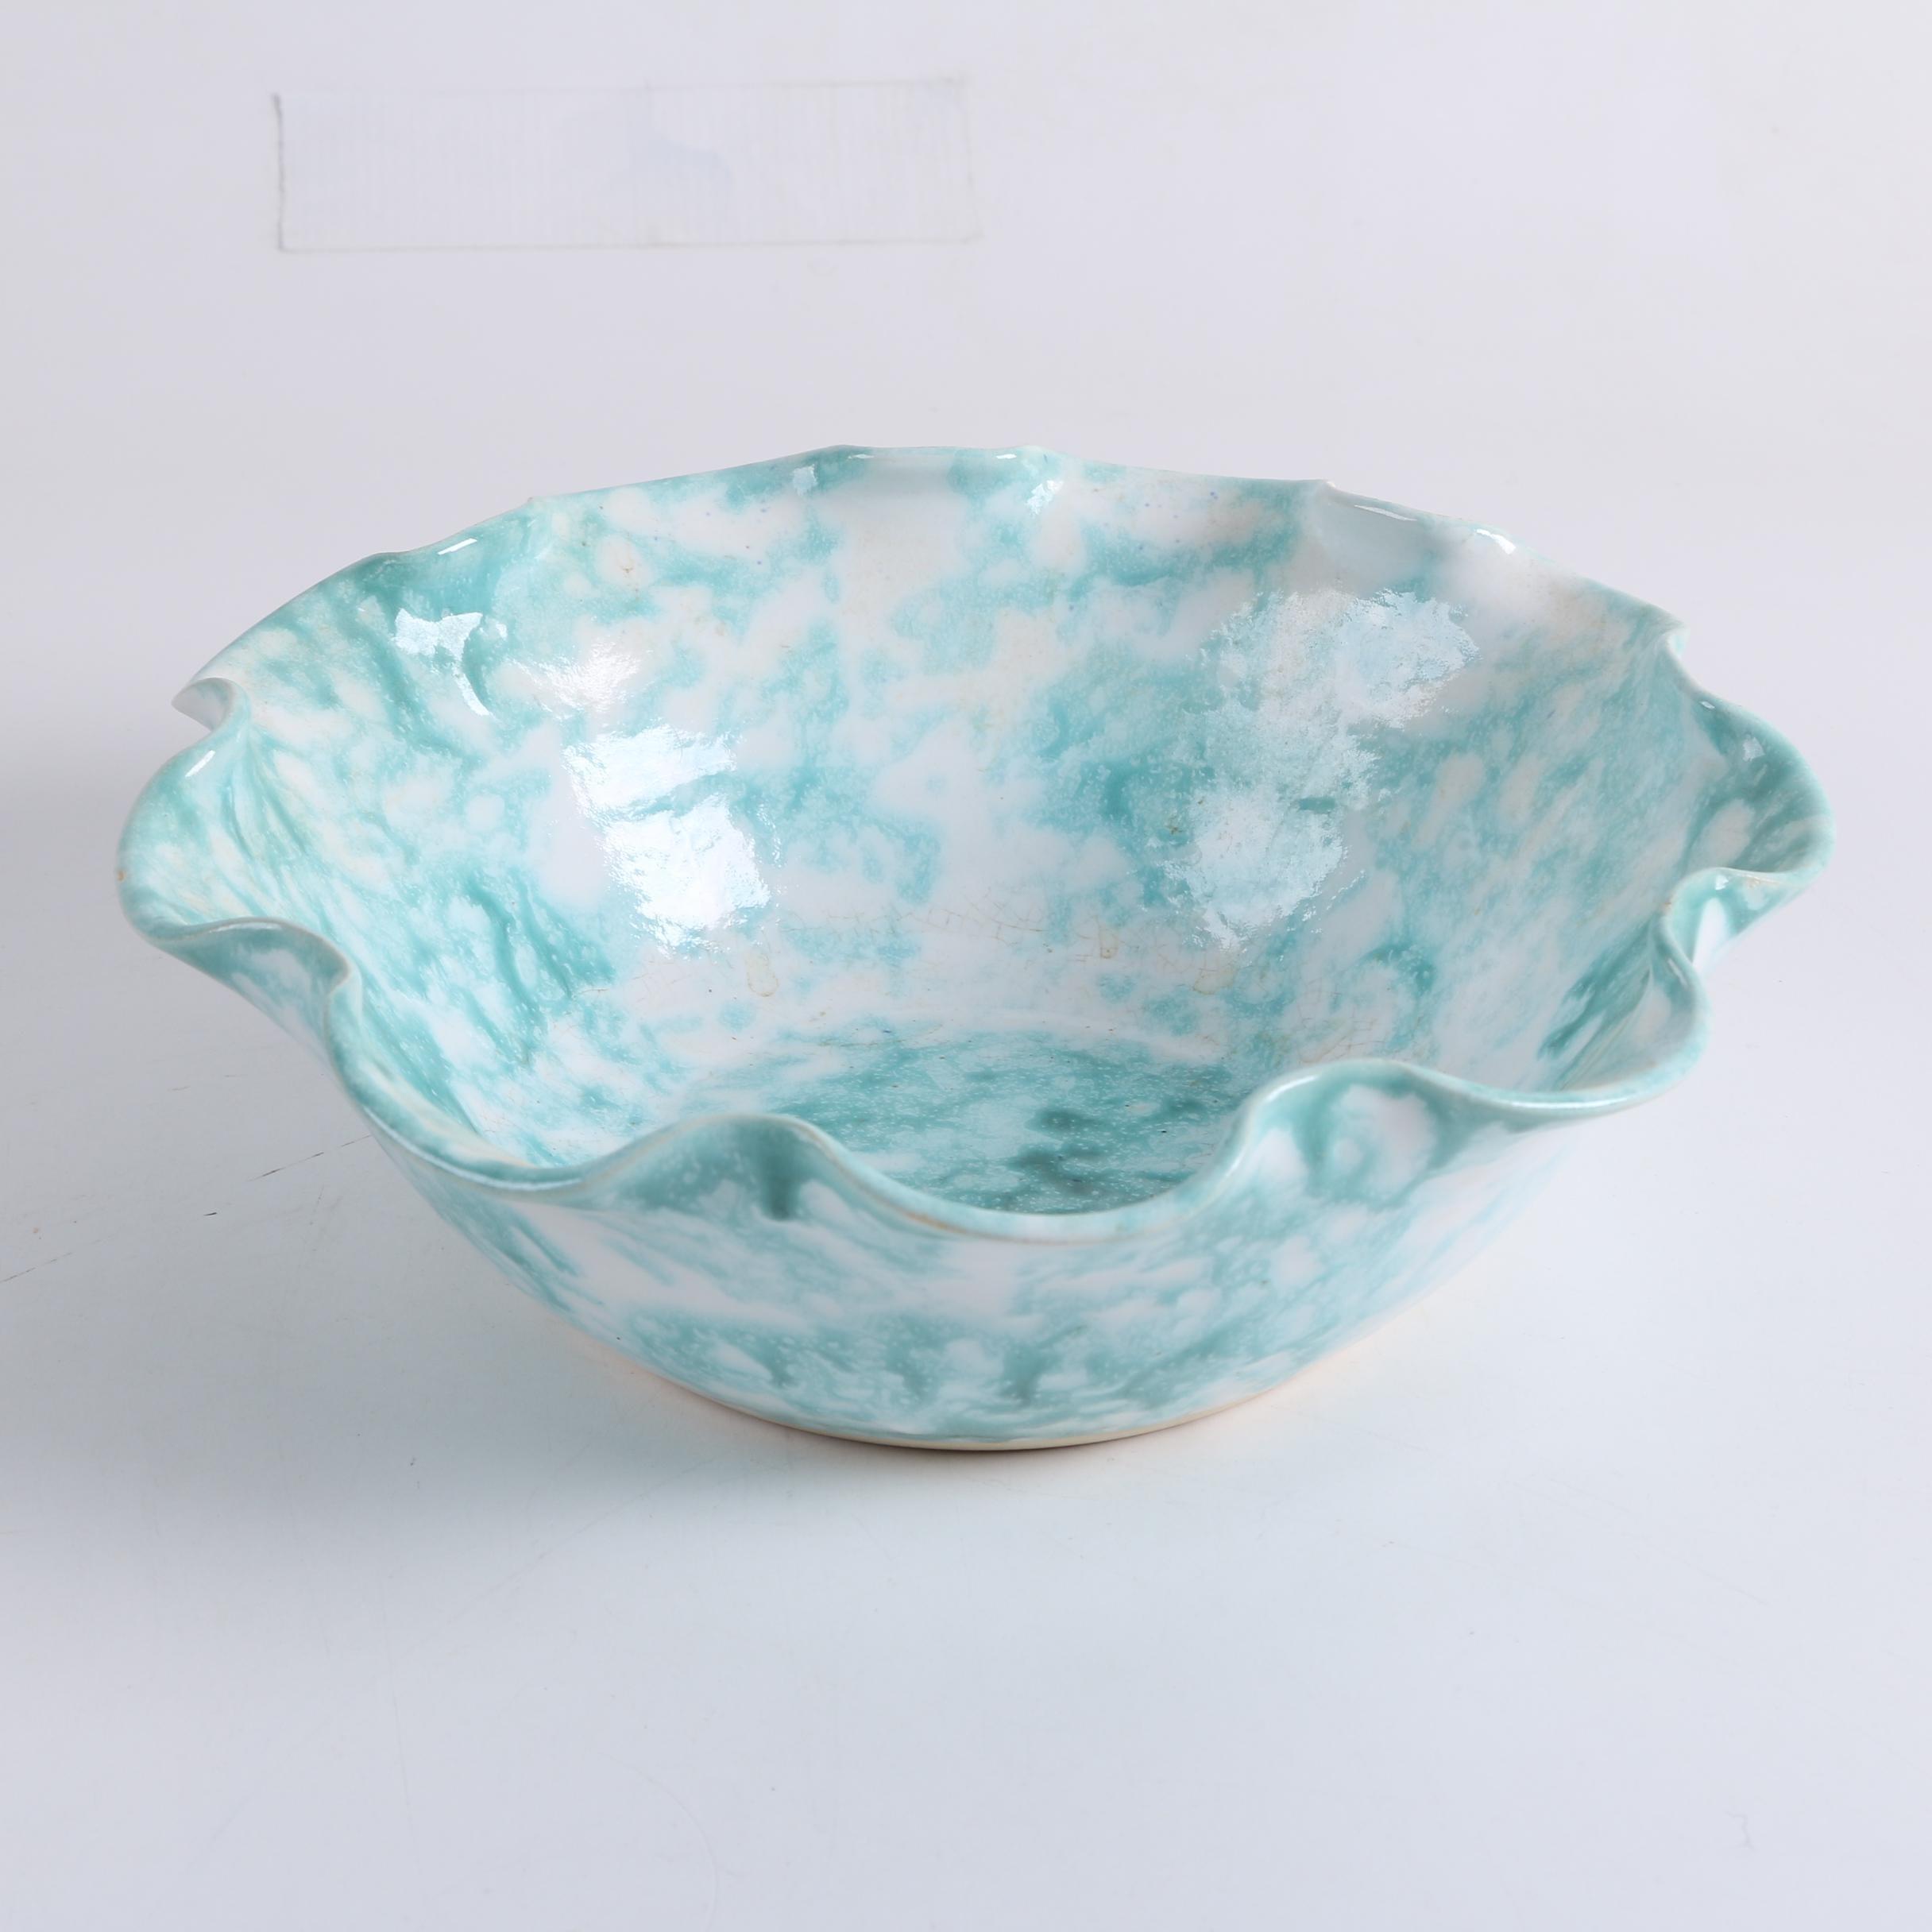 Signed Ceramic Centerpiece Bowl